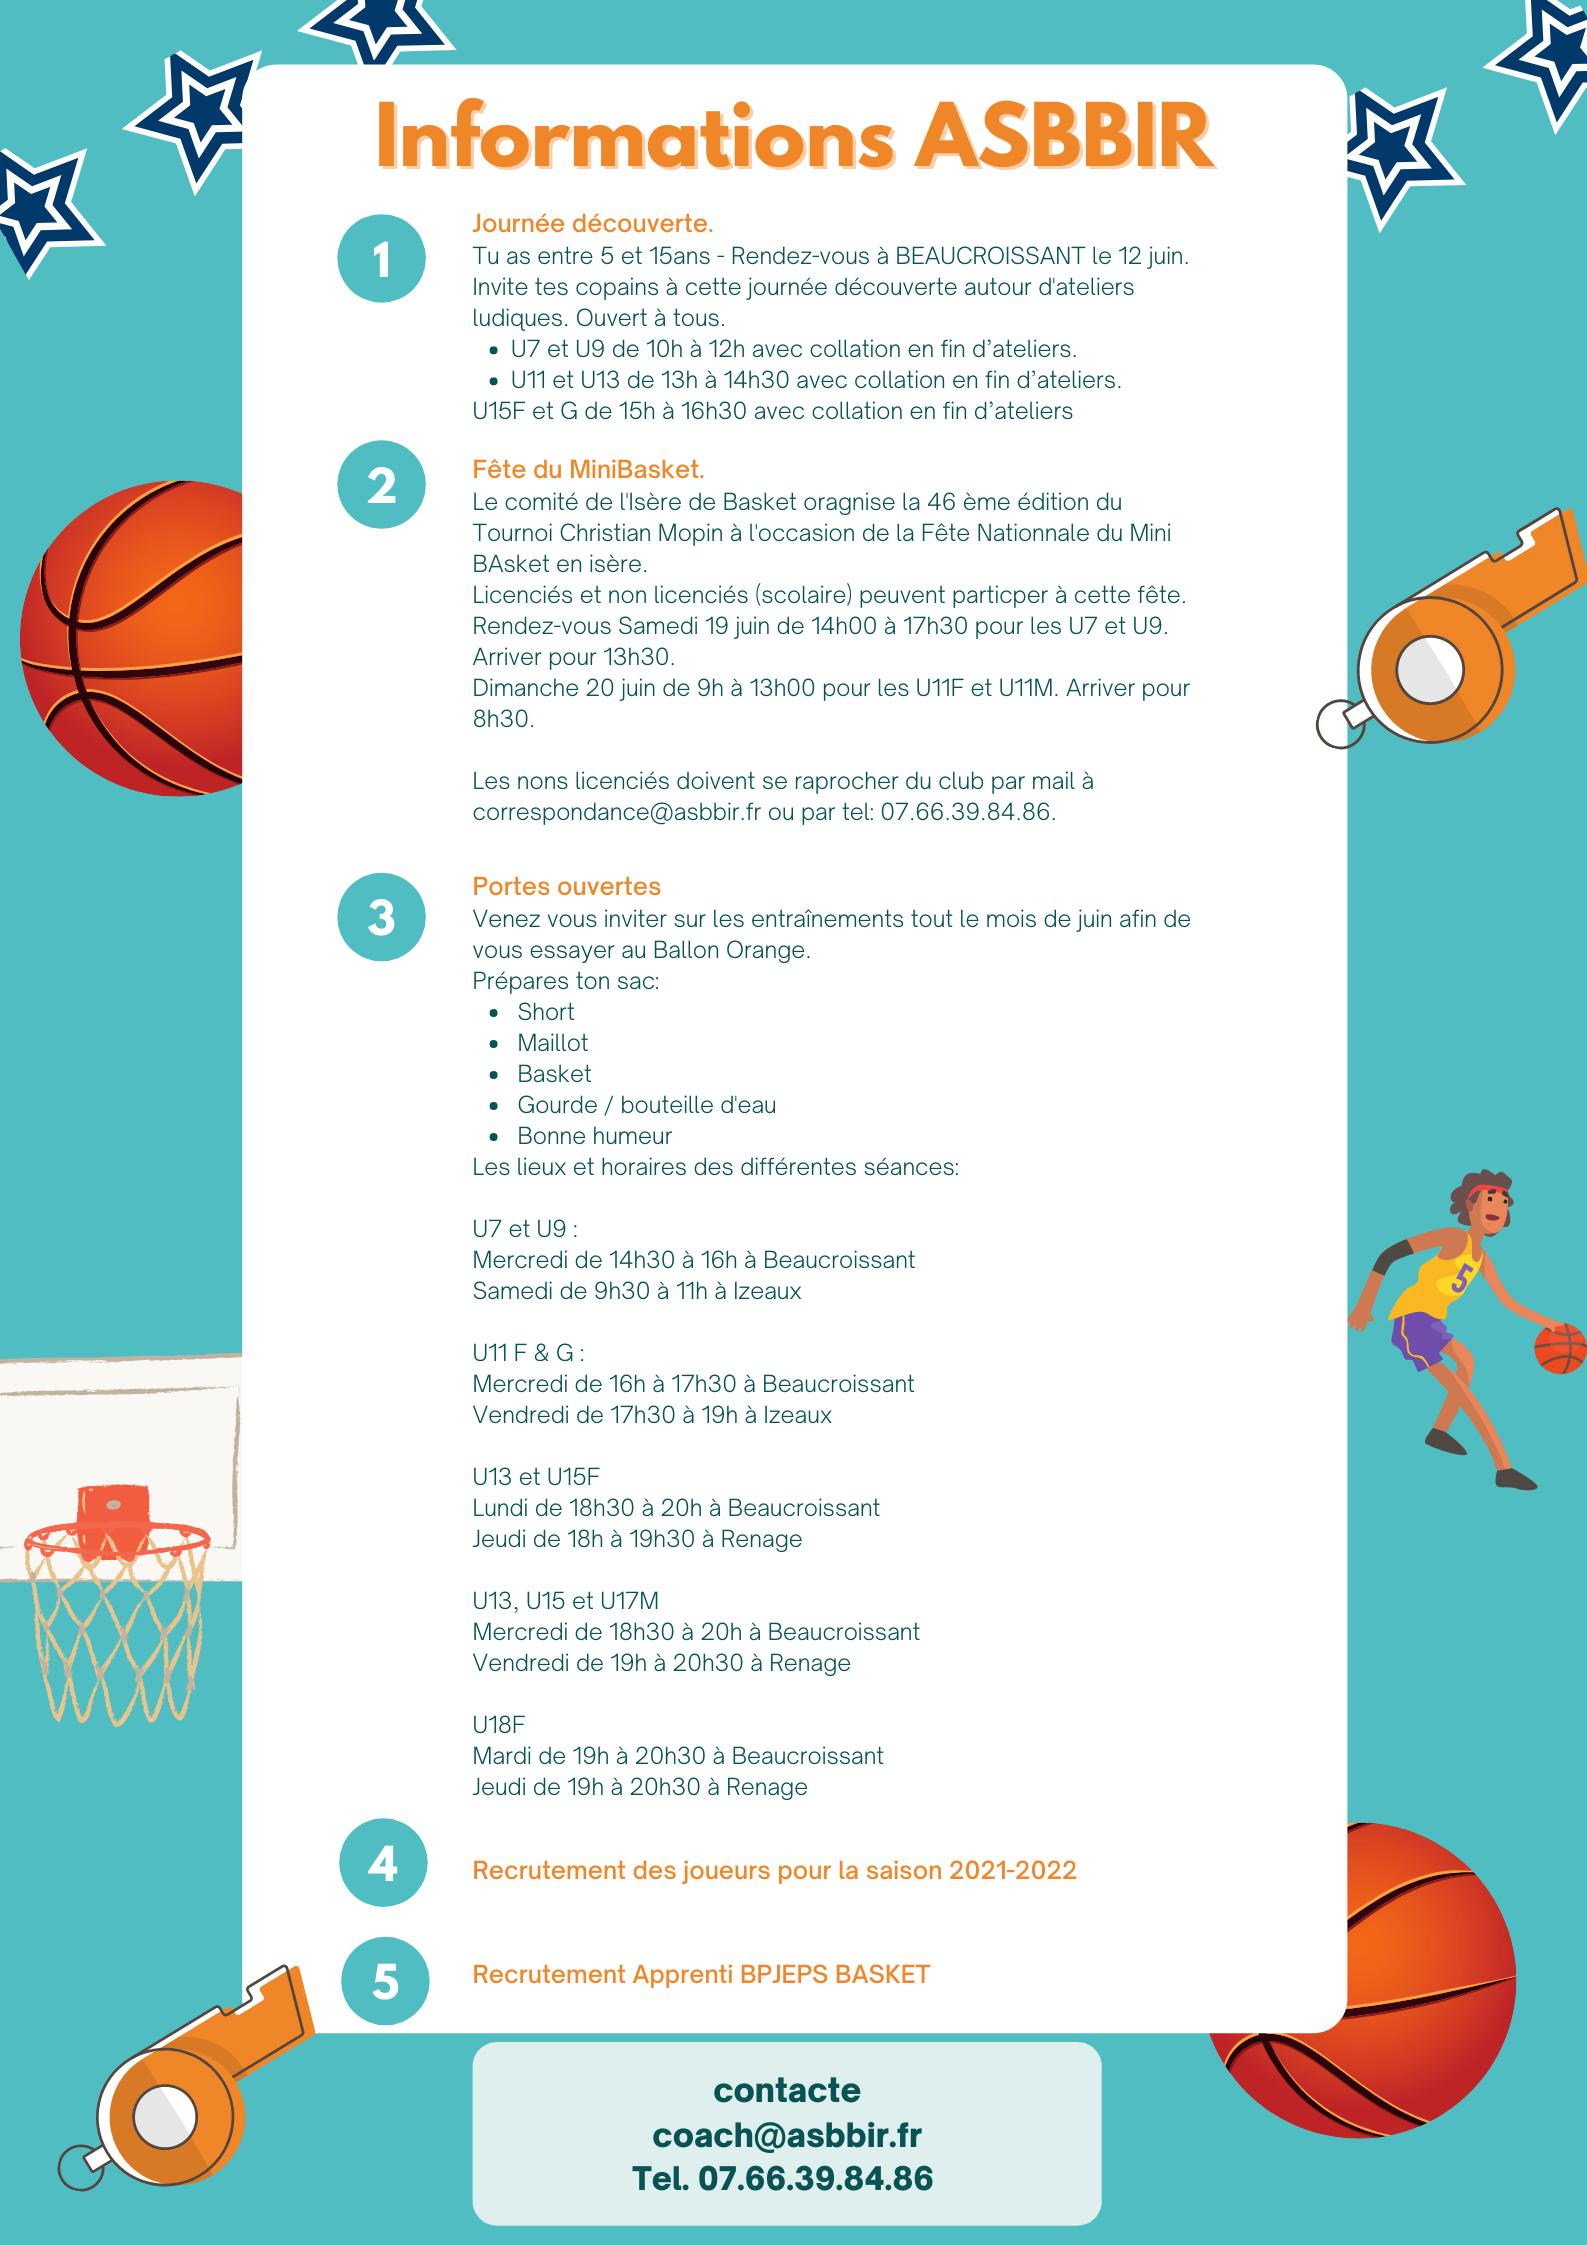 Image de couverture - [INFORMATIONS Club de basket ASBBIR]